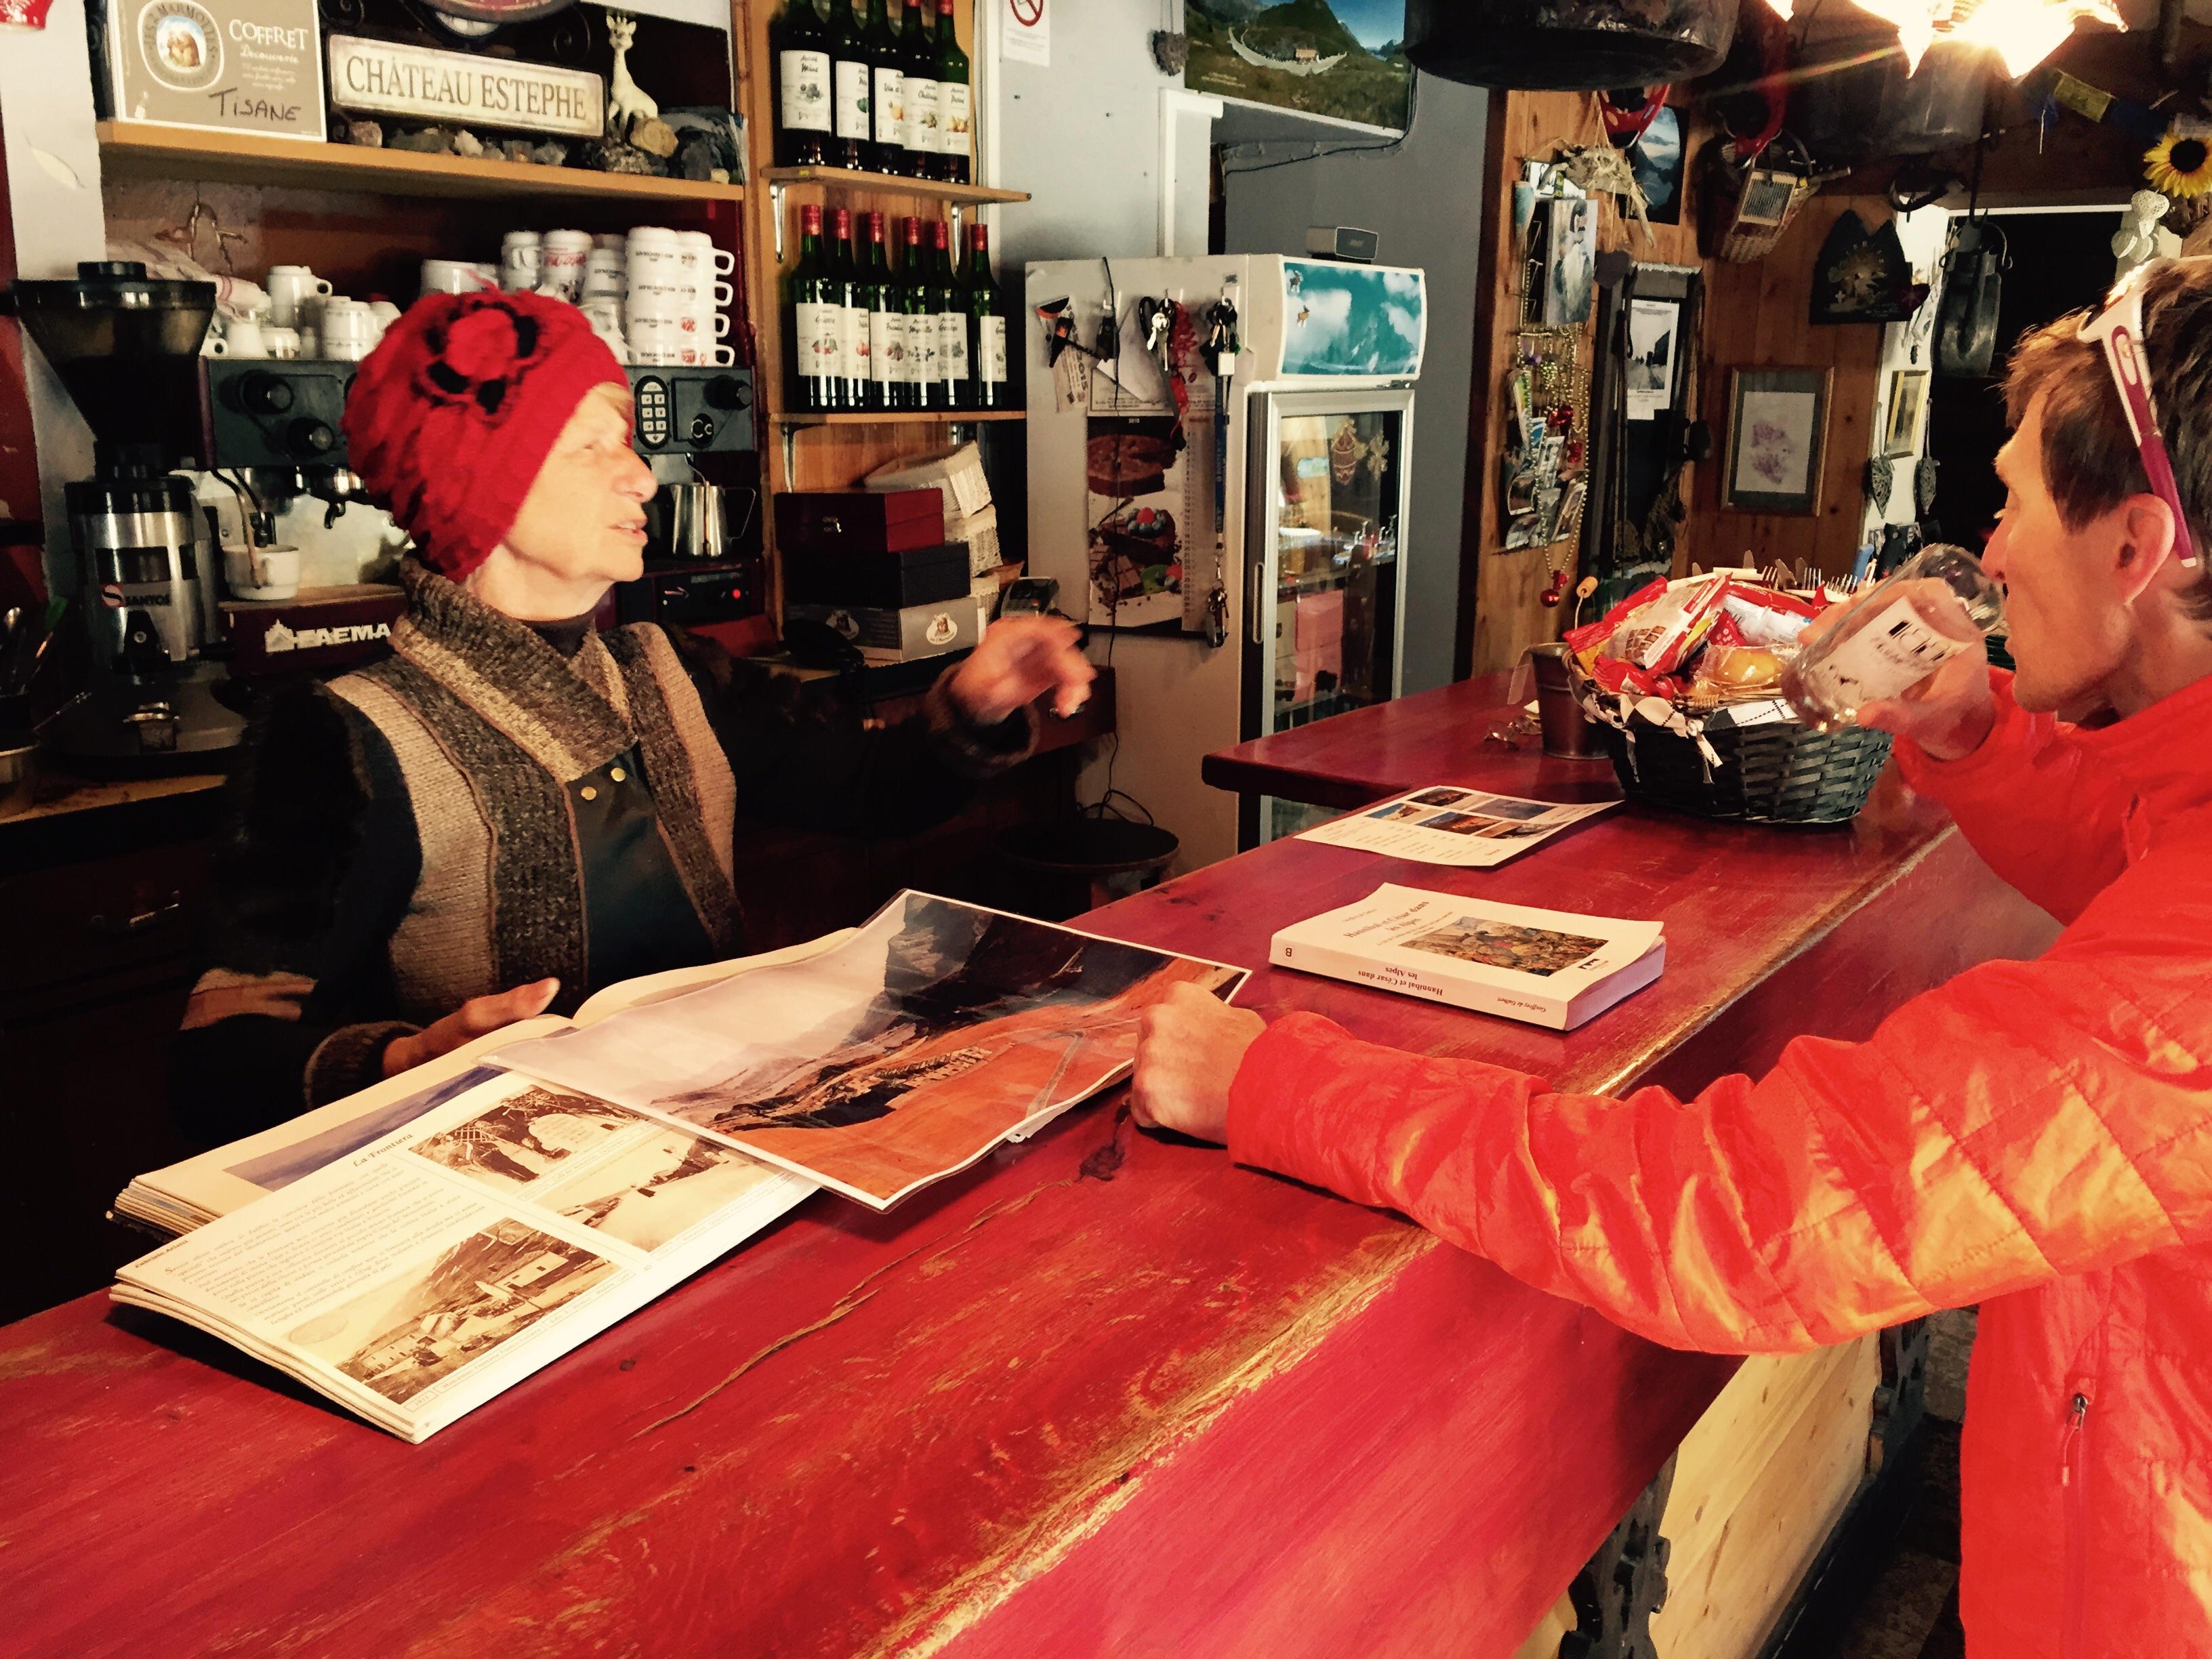 Friendly historian bar lady, Mont Cenis